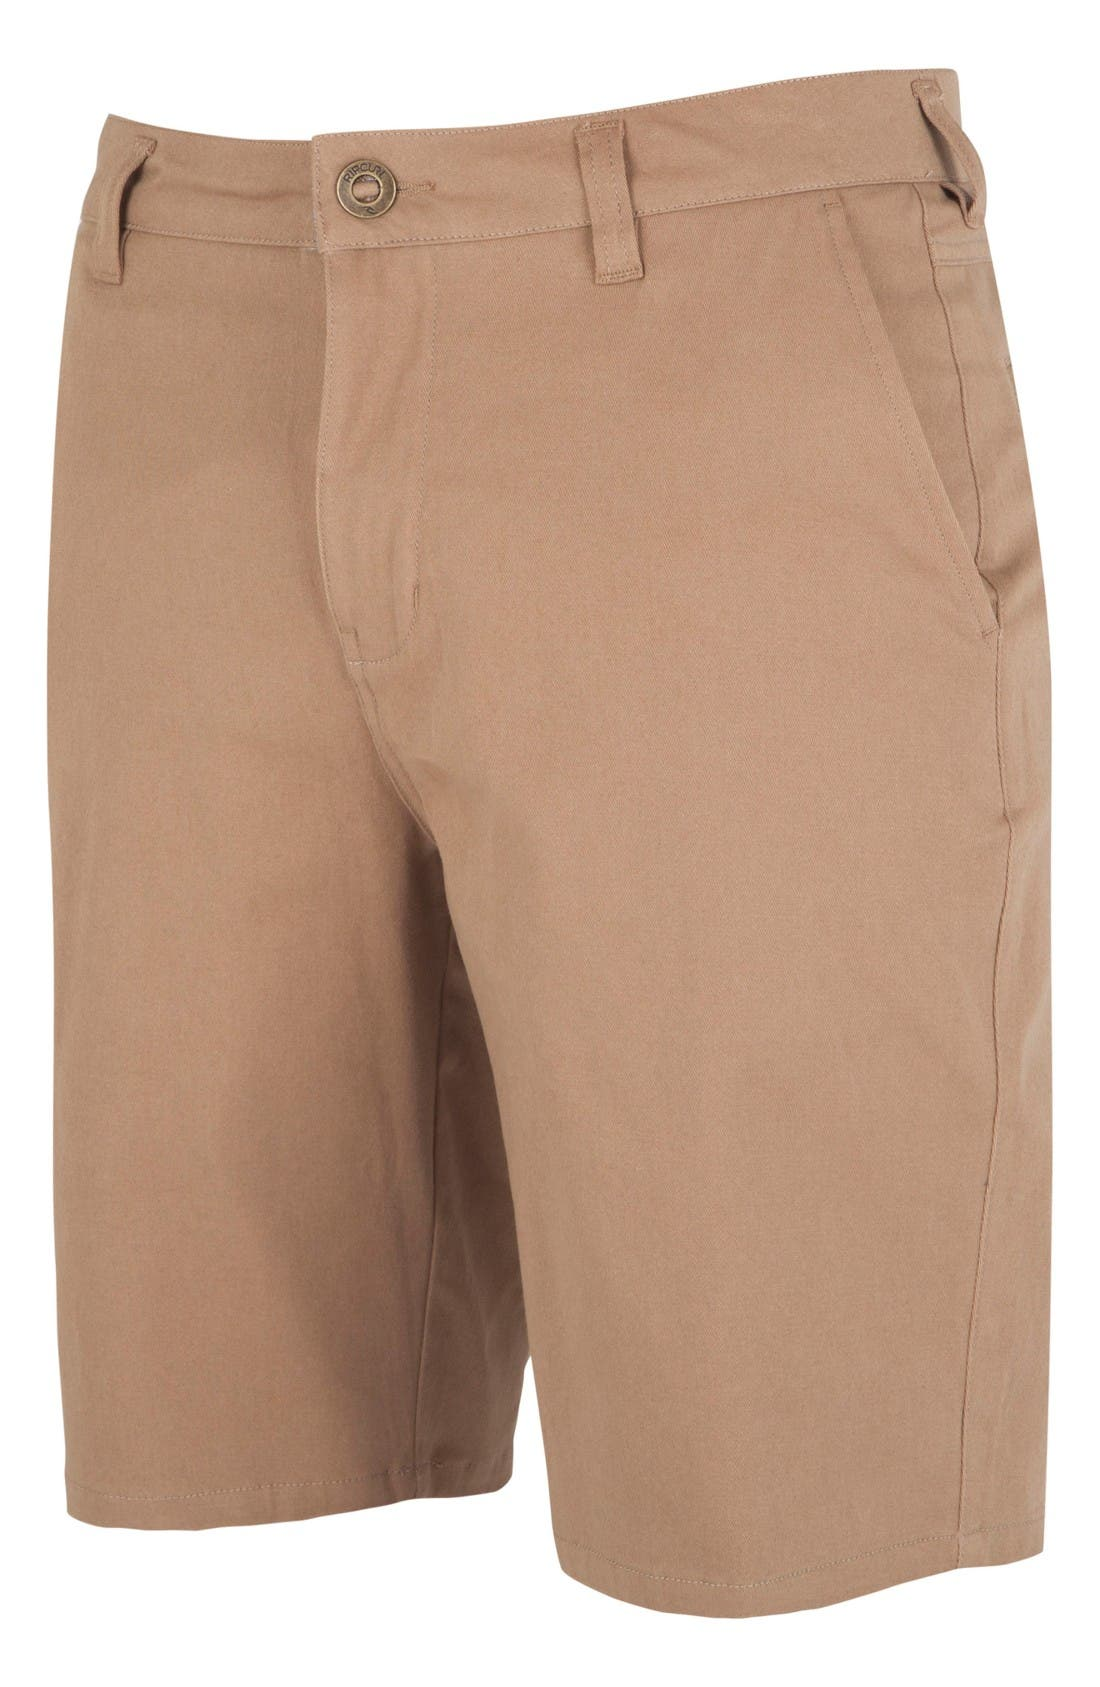 Rip Curl Epic Stretch Chino Shorts (Big Boys)